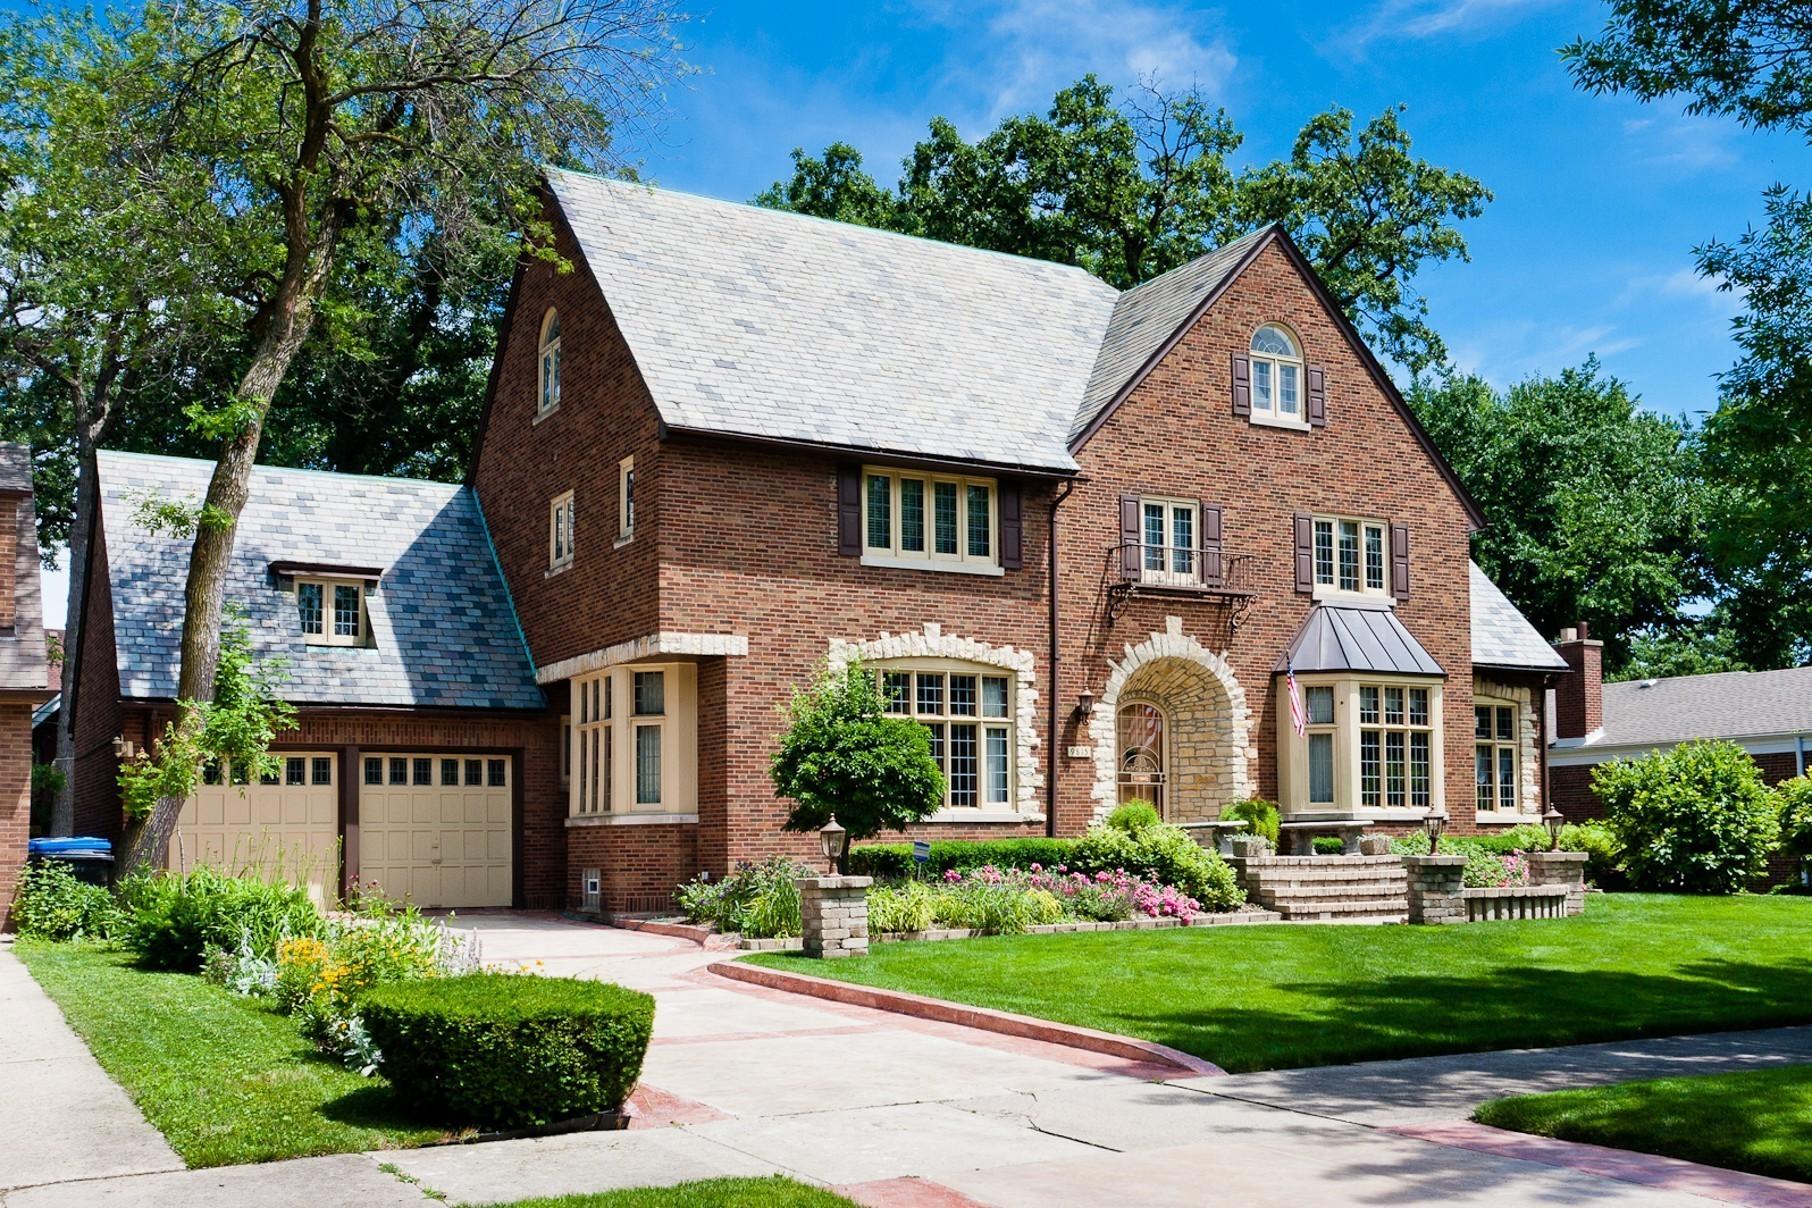 Tudor style chicago home 899 000 chicago tribune for Tudor style house for sale